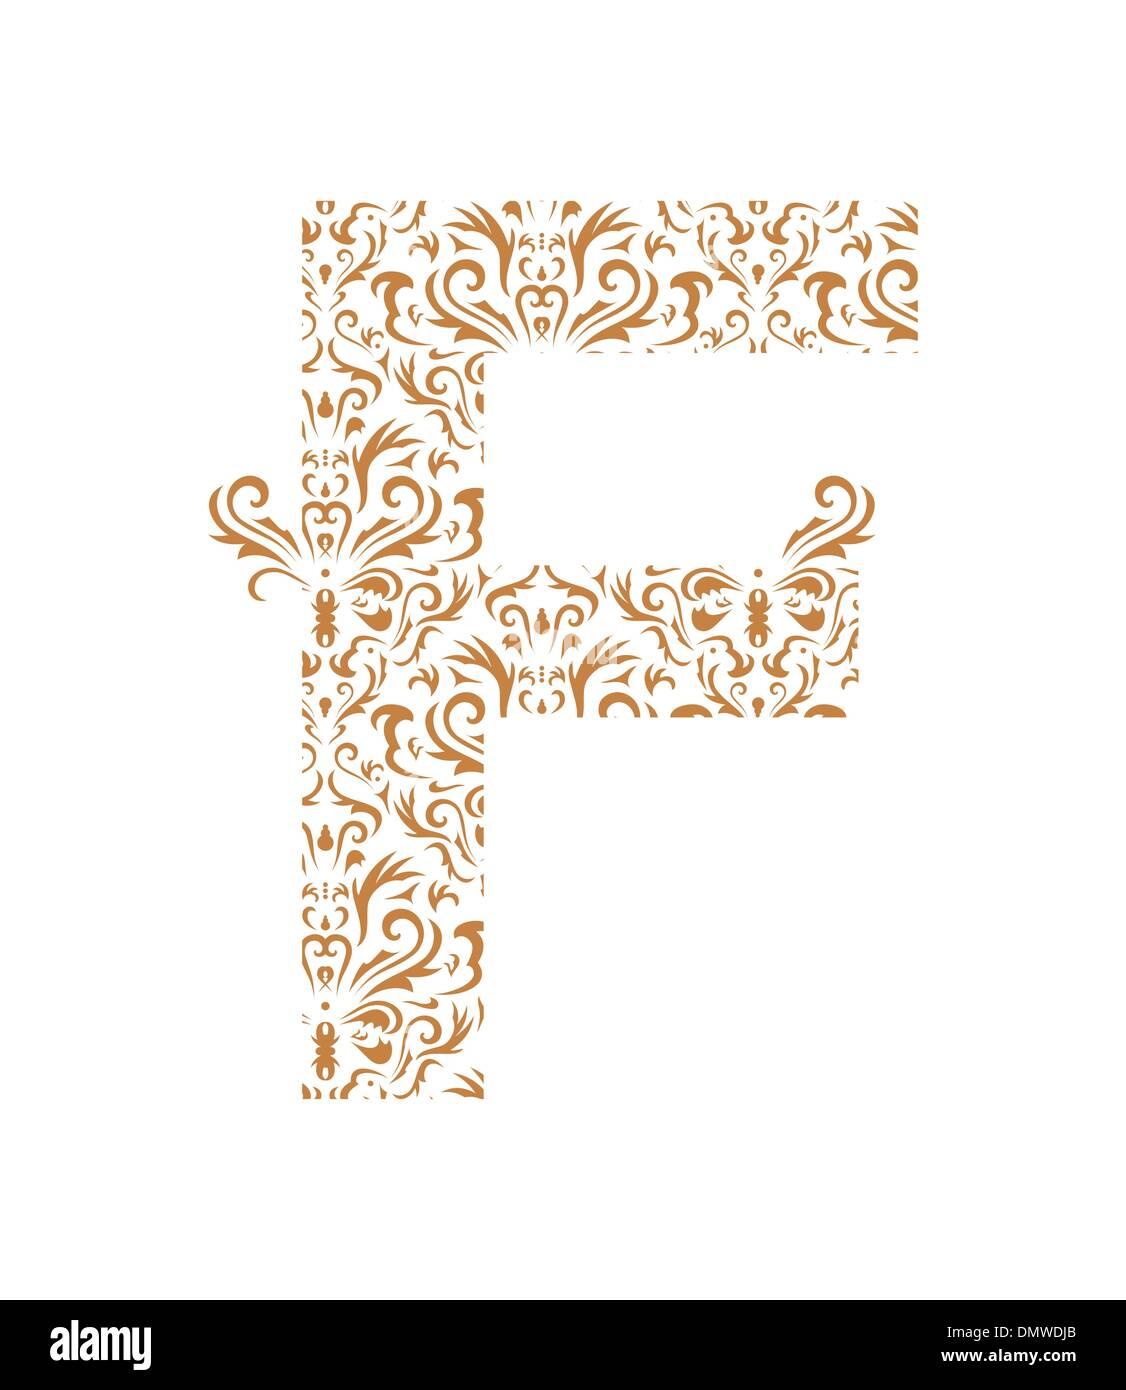 Floral Letter F Ornament Font